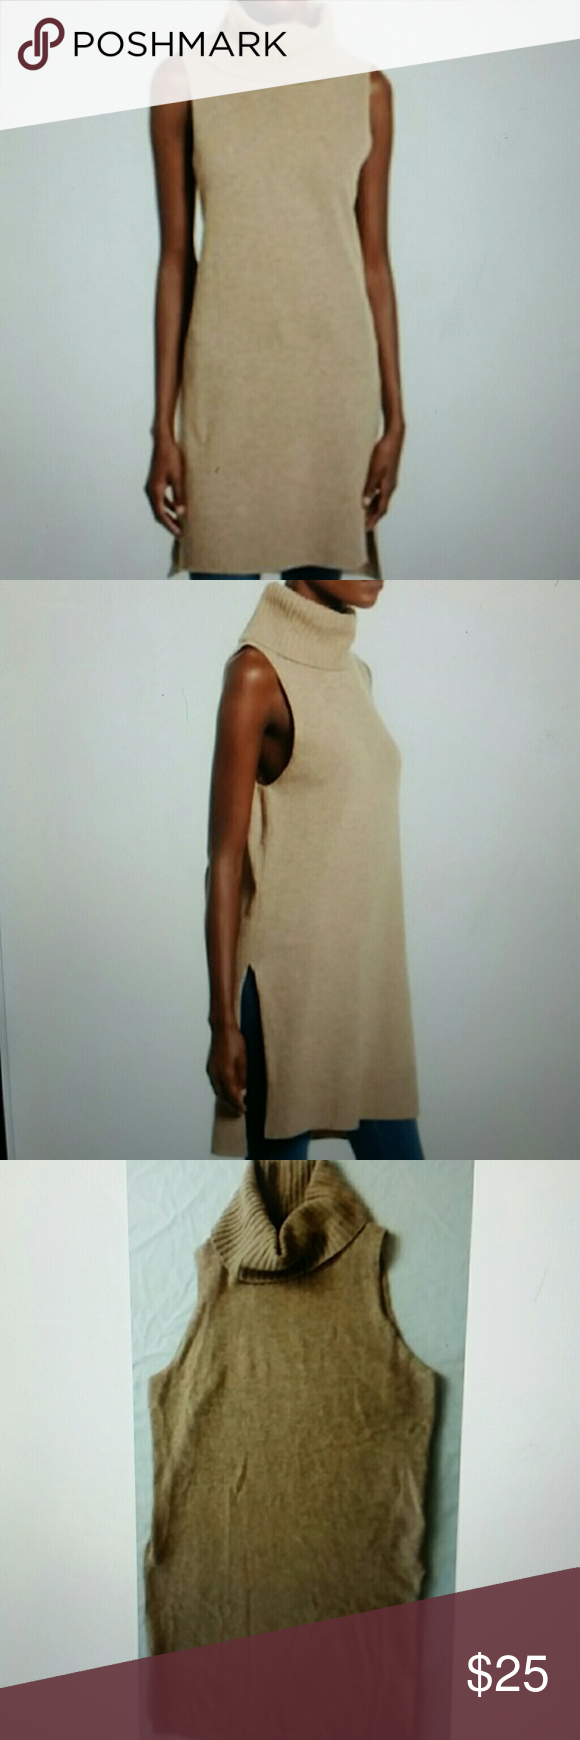 Chloe & Katie Sleeveless Turtleneck Tunic Sweater Great for